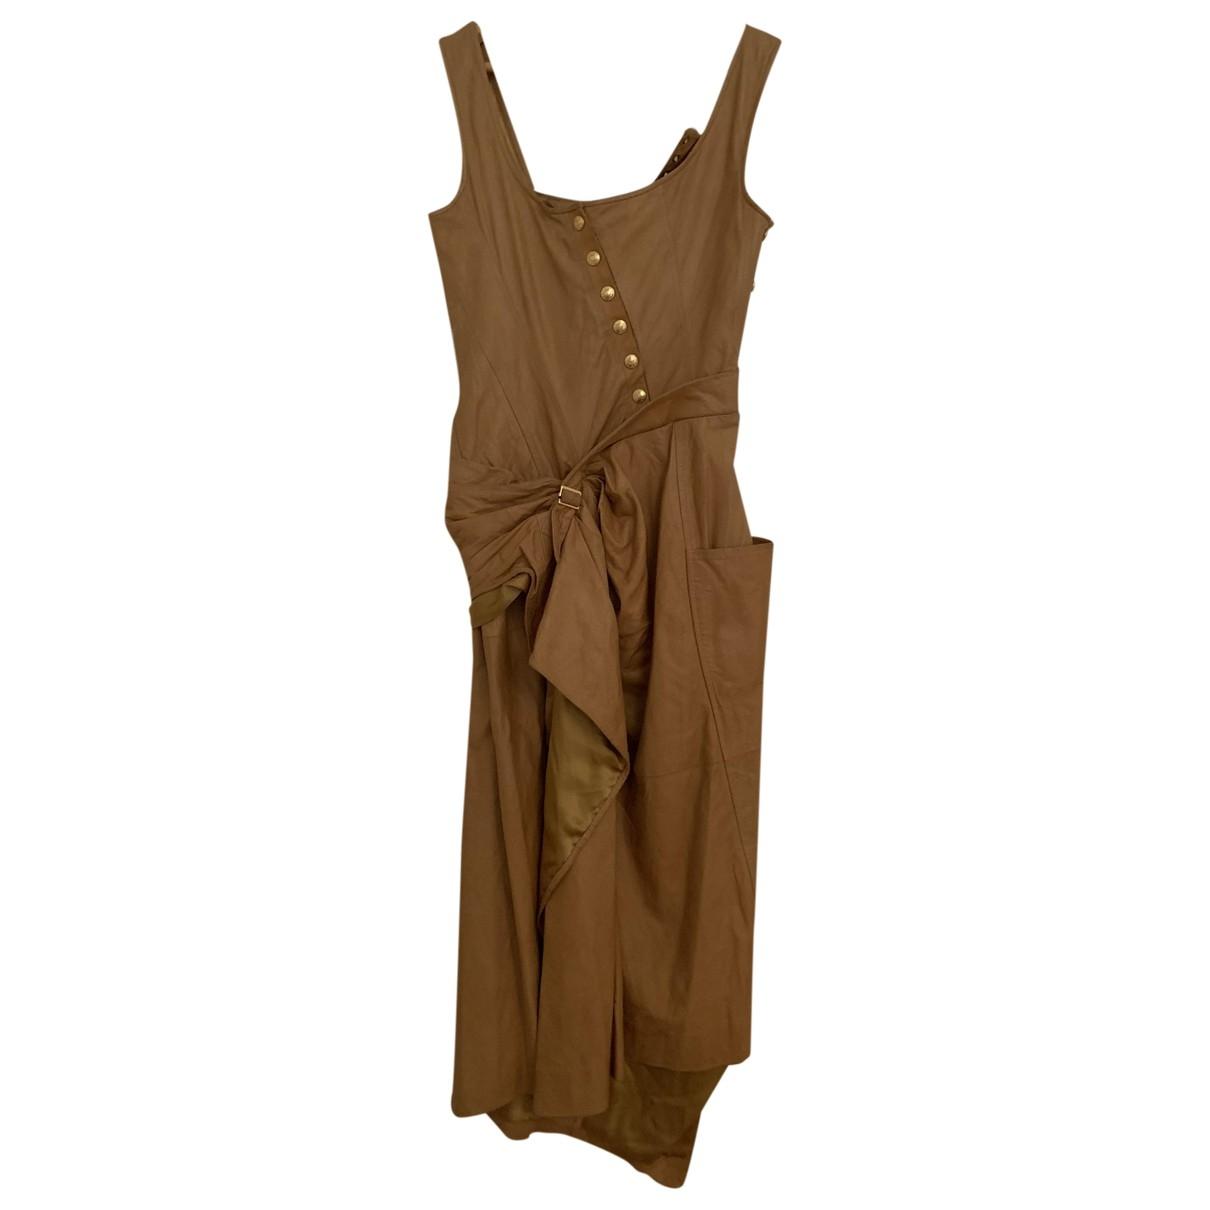 Dior \N Camel Leather dress for Women 36 FR